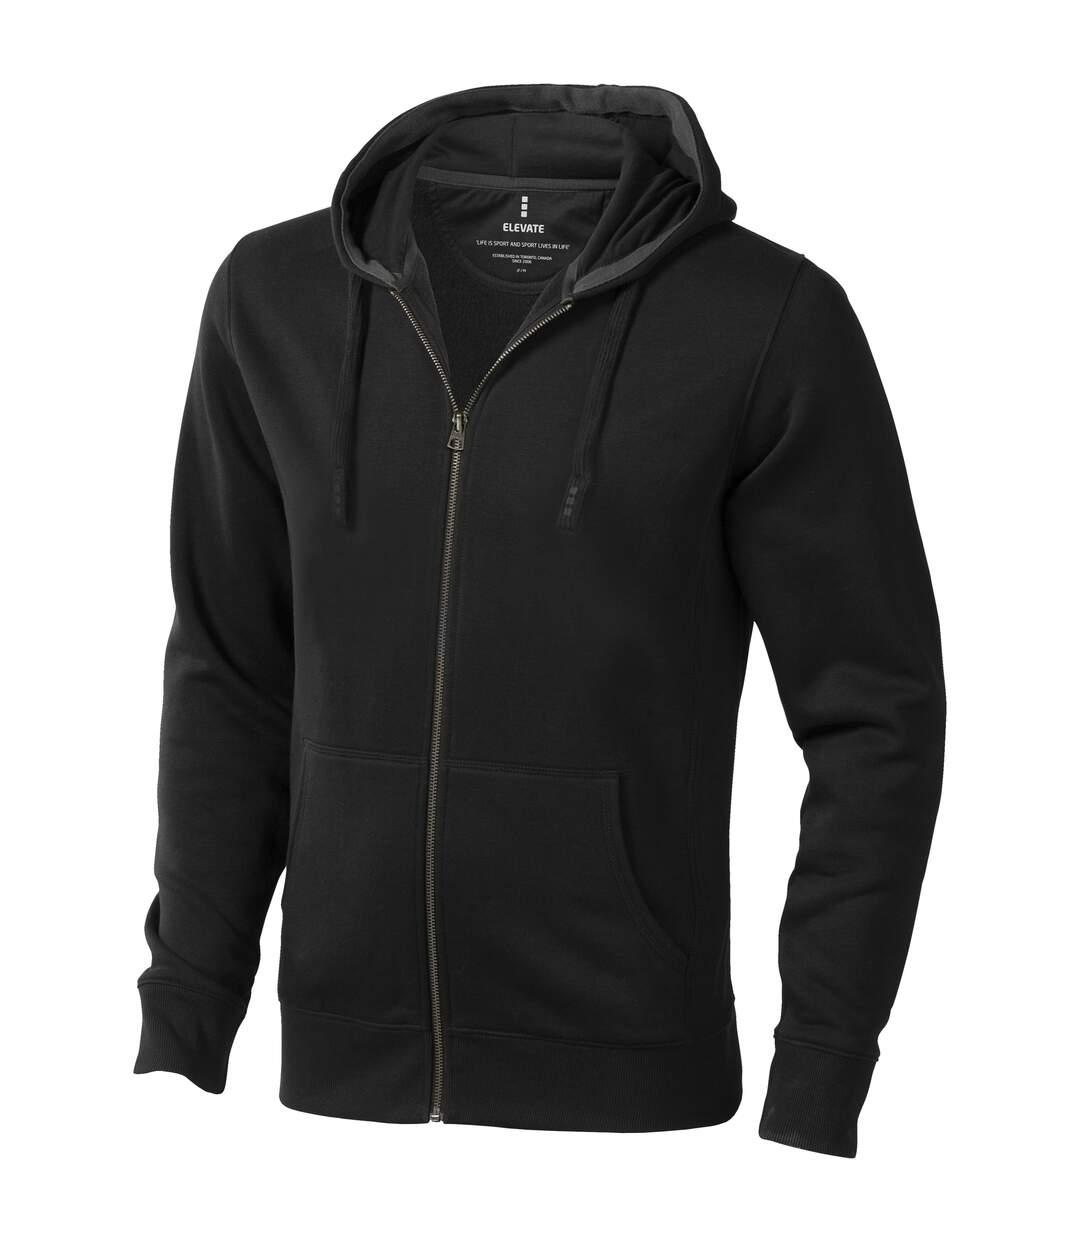 Elevate Mens Arora Hooded Full Zip Sweater (Anthracite) - UTPF1850